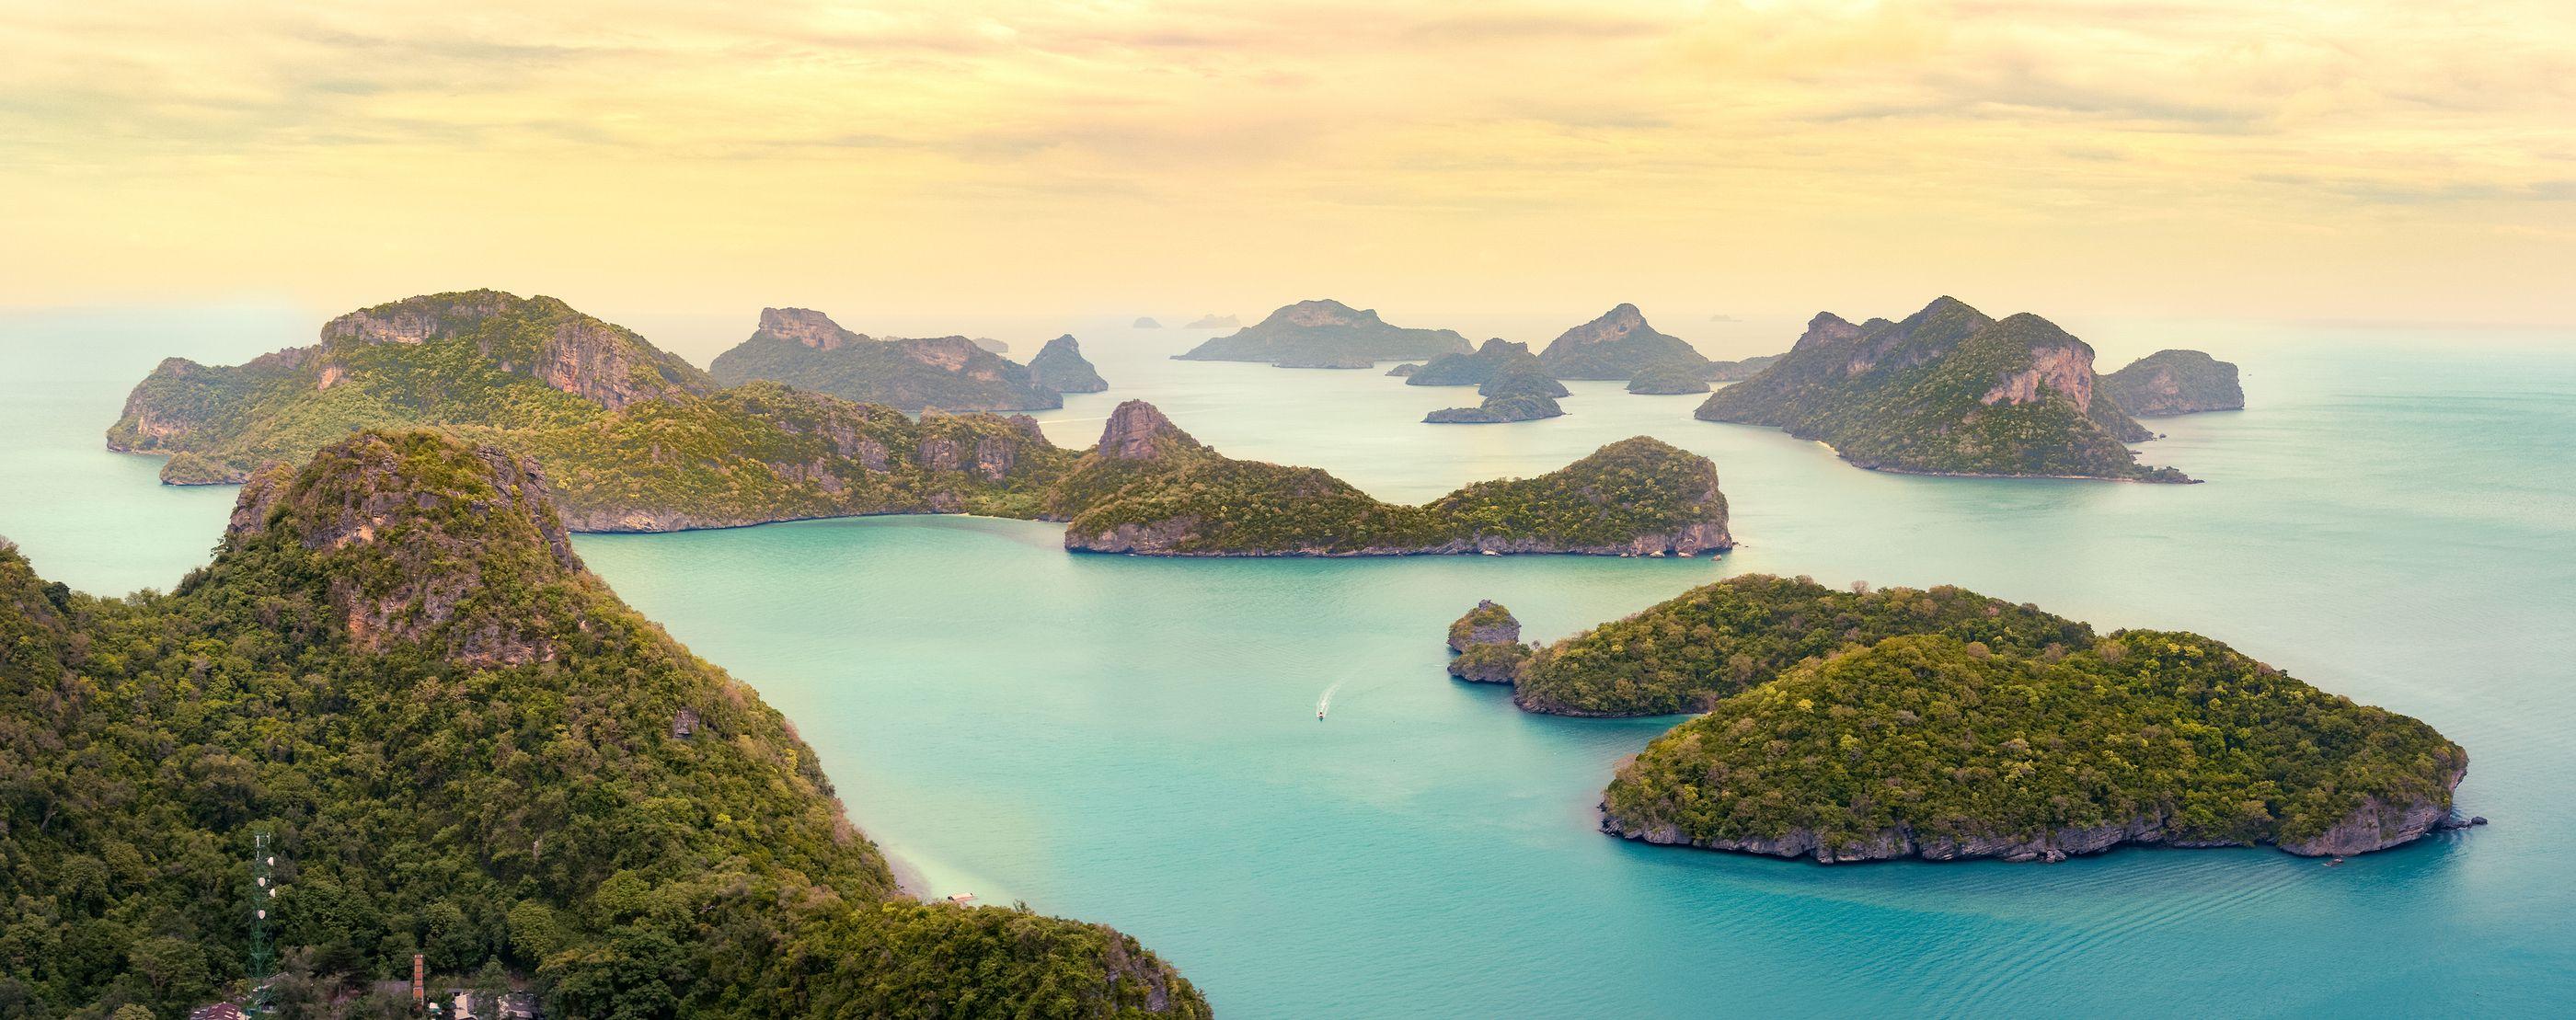 Mořský NP Ang Thong